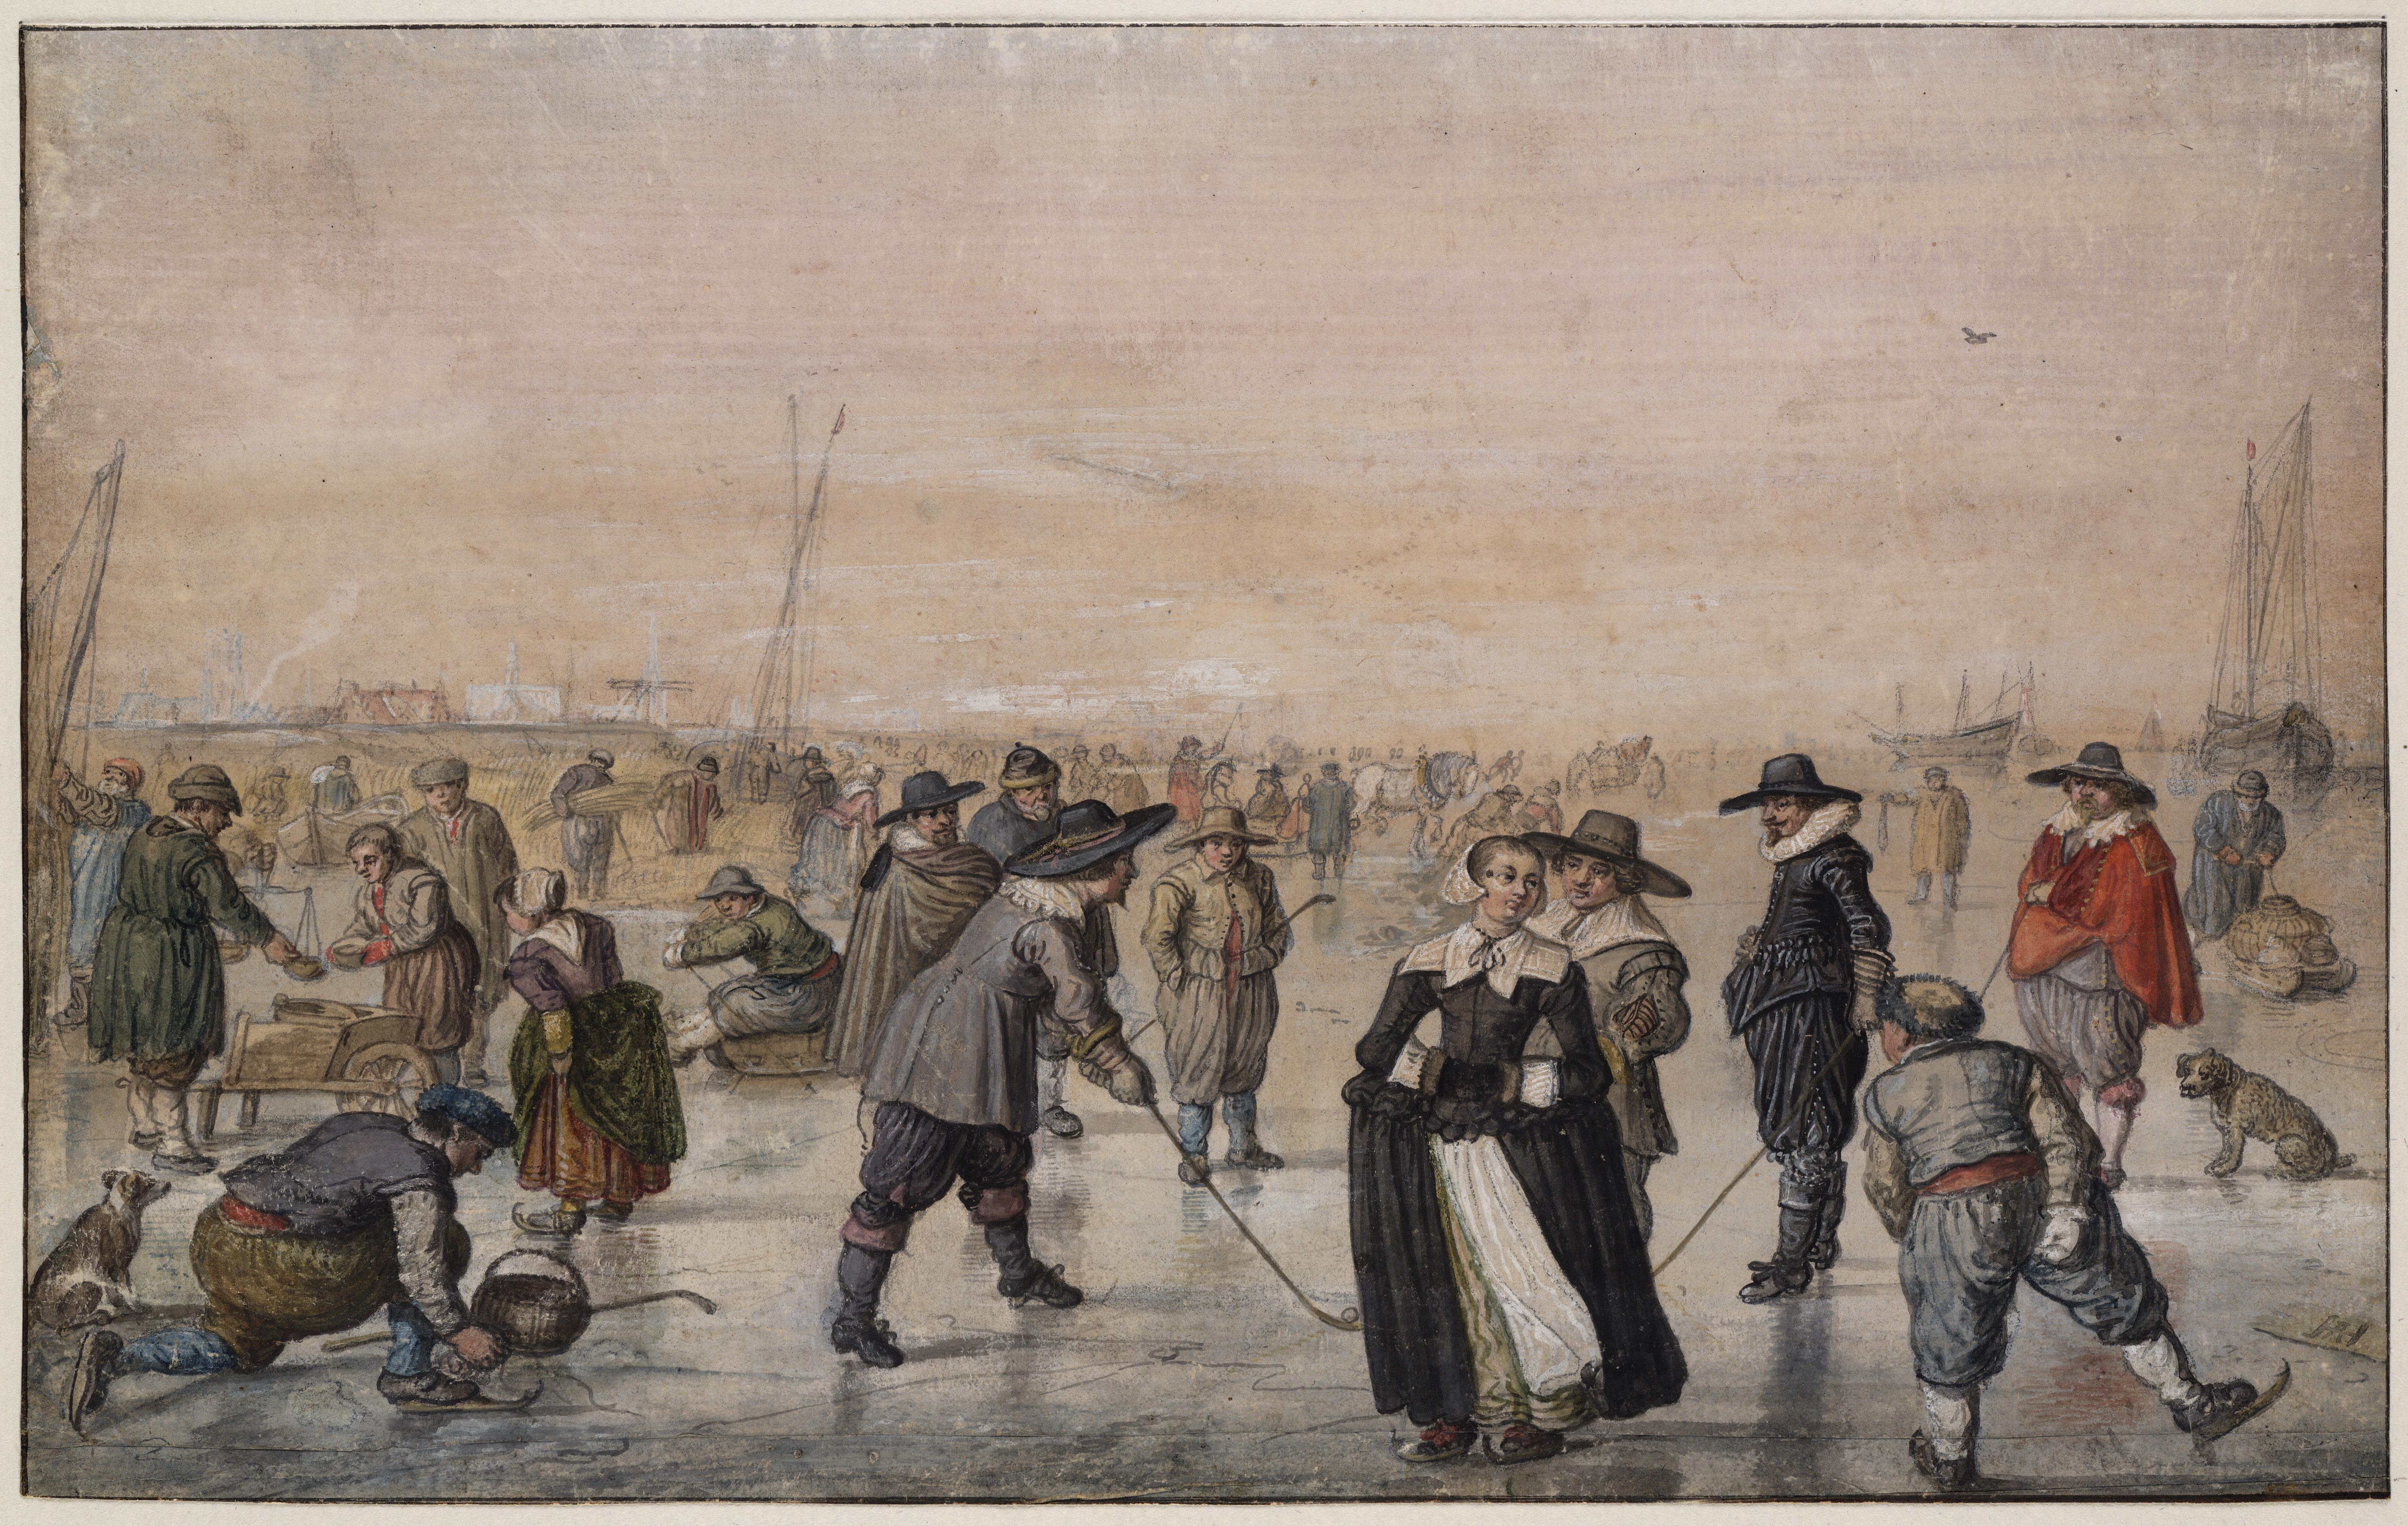 'Skating fun' by 17th century Dutch painter by Hendrick Avercamp.